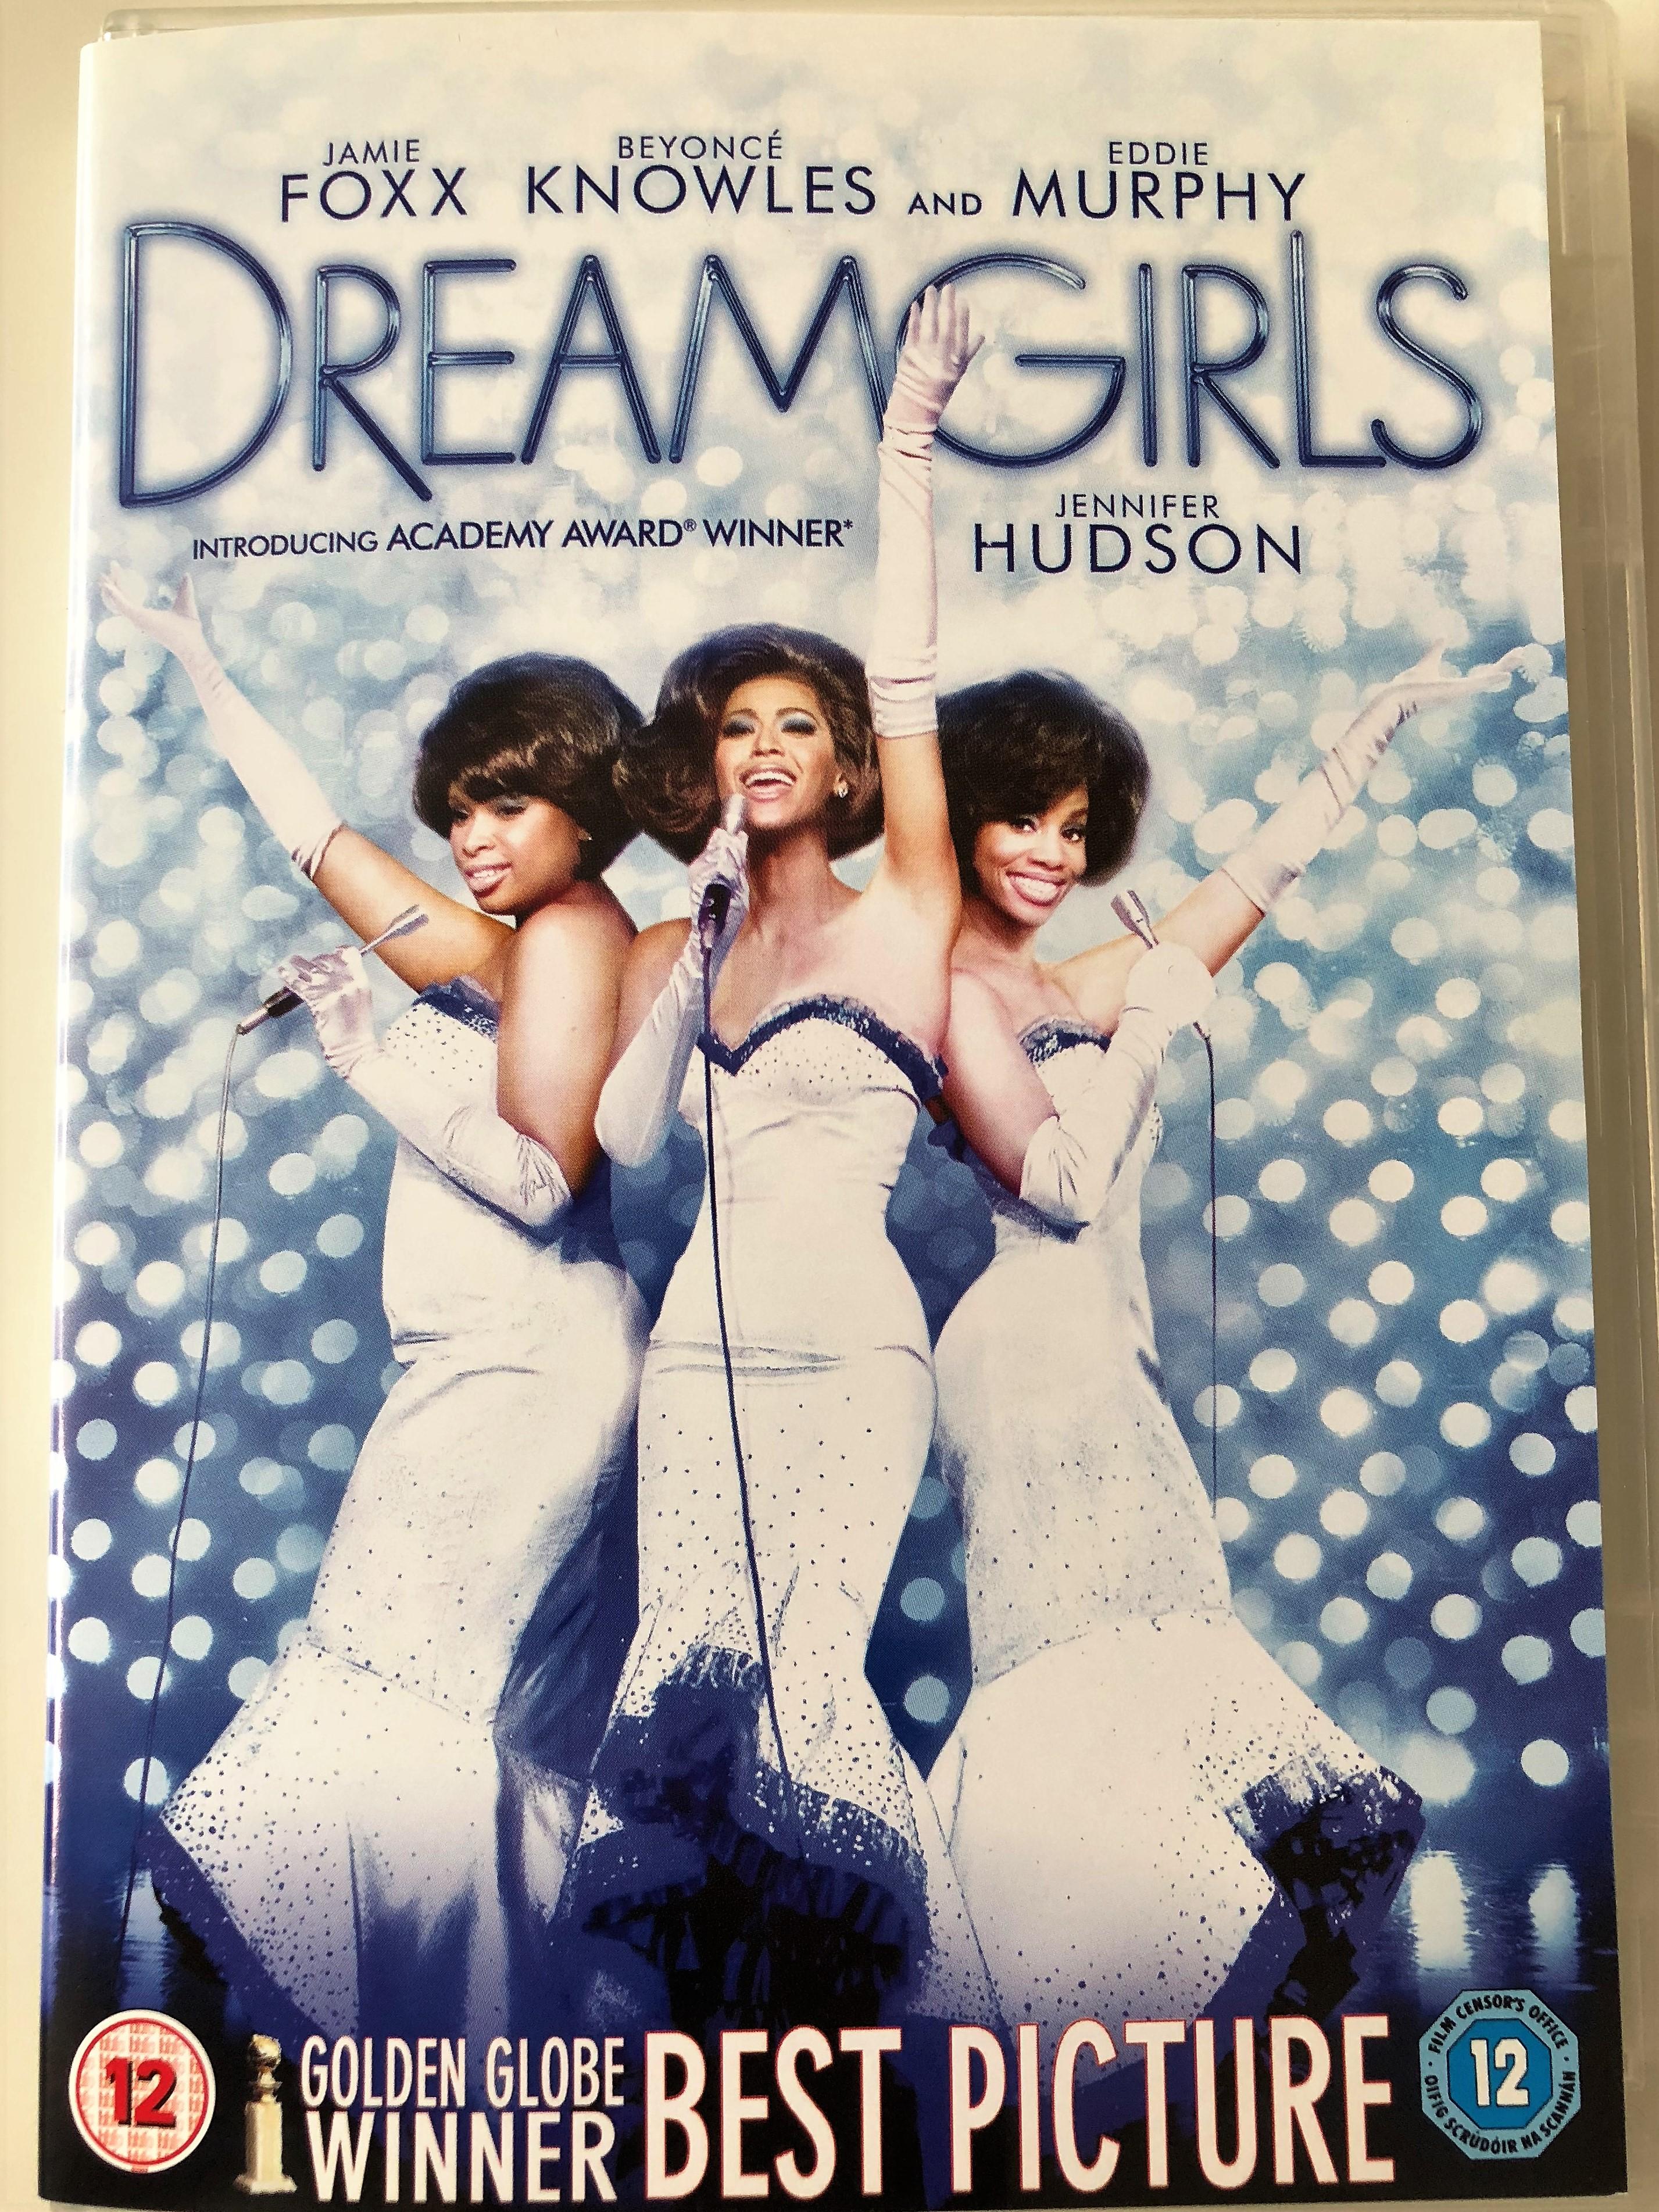 dream-girls-dvd-directed-by-bill-condon-starring-jamie-foxx-beyonc-knowles-eddie-murphy-danny-glover-anika-noni-rose-keith-robinson-jennifer-hudson-1-.jpg